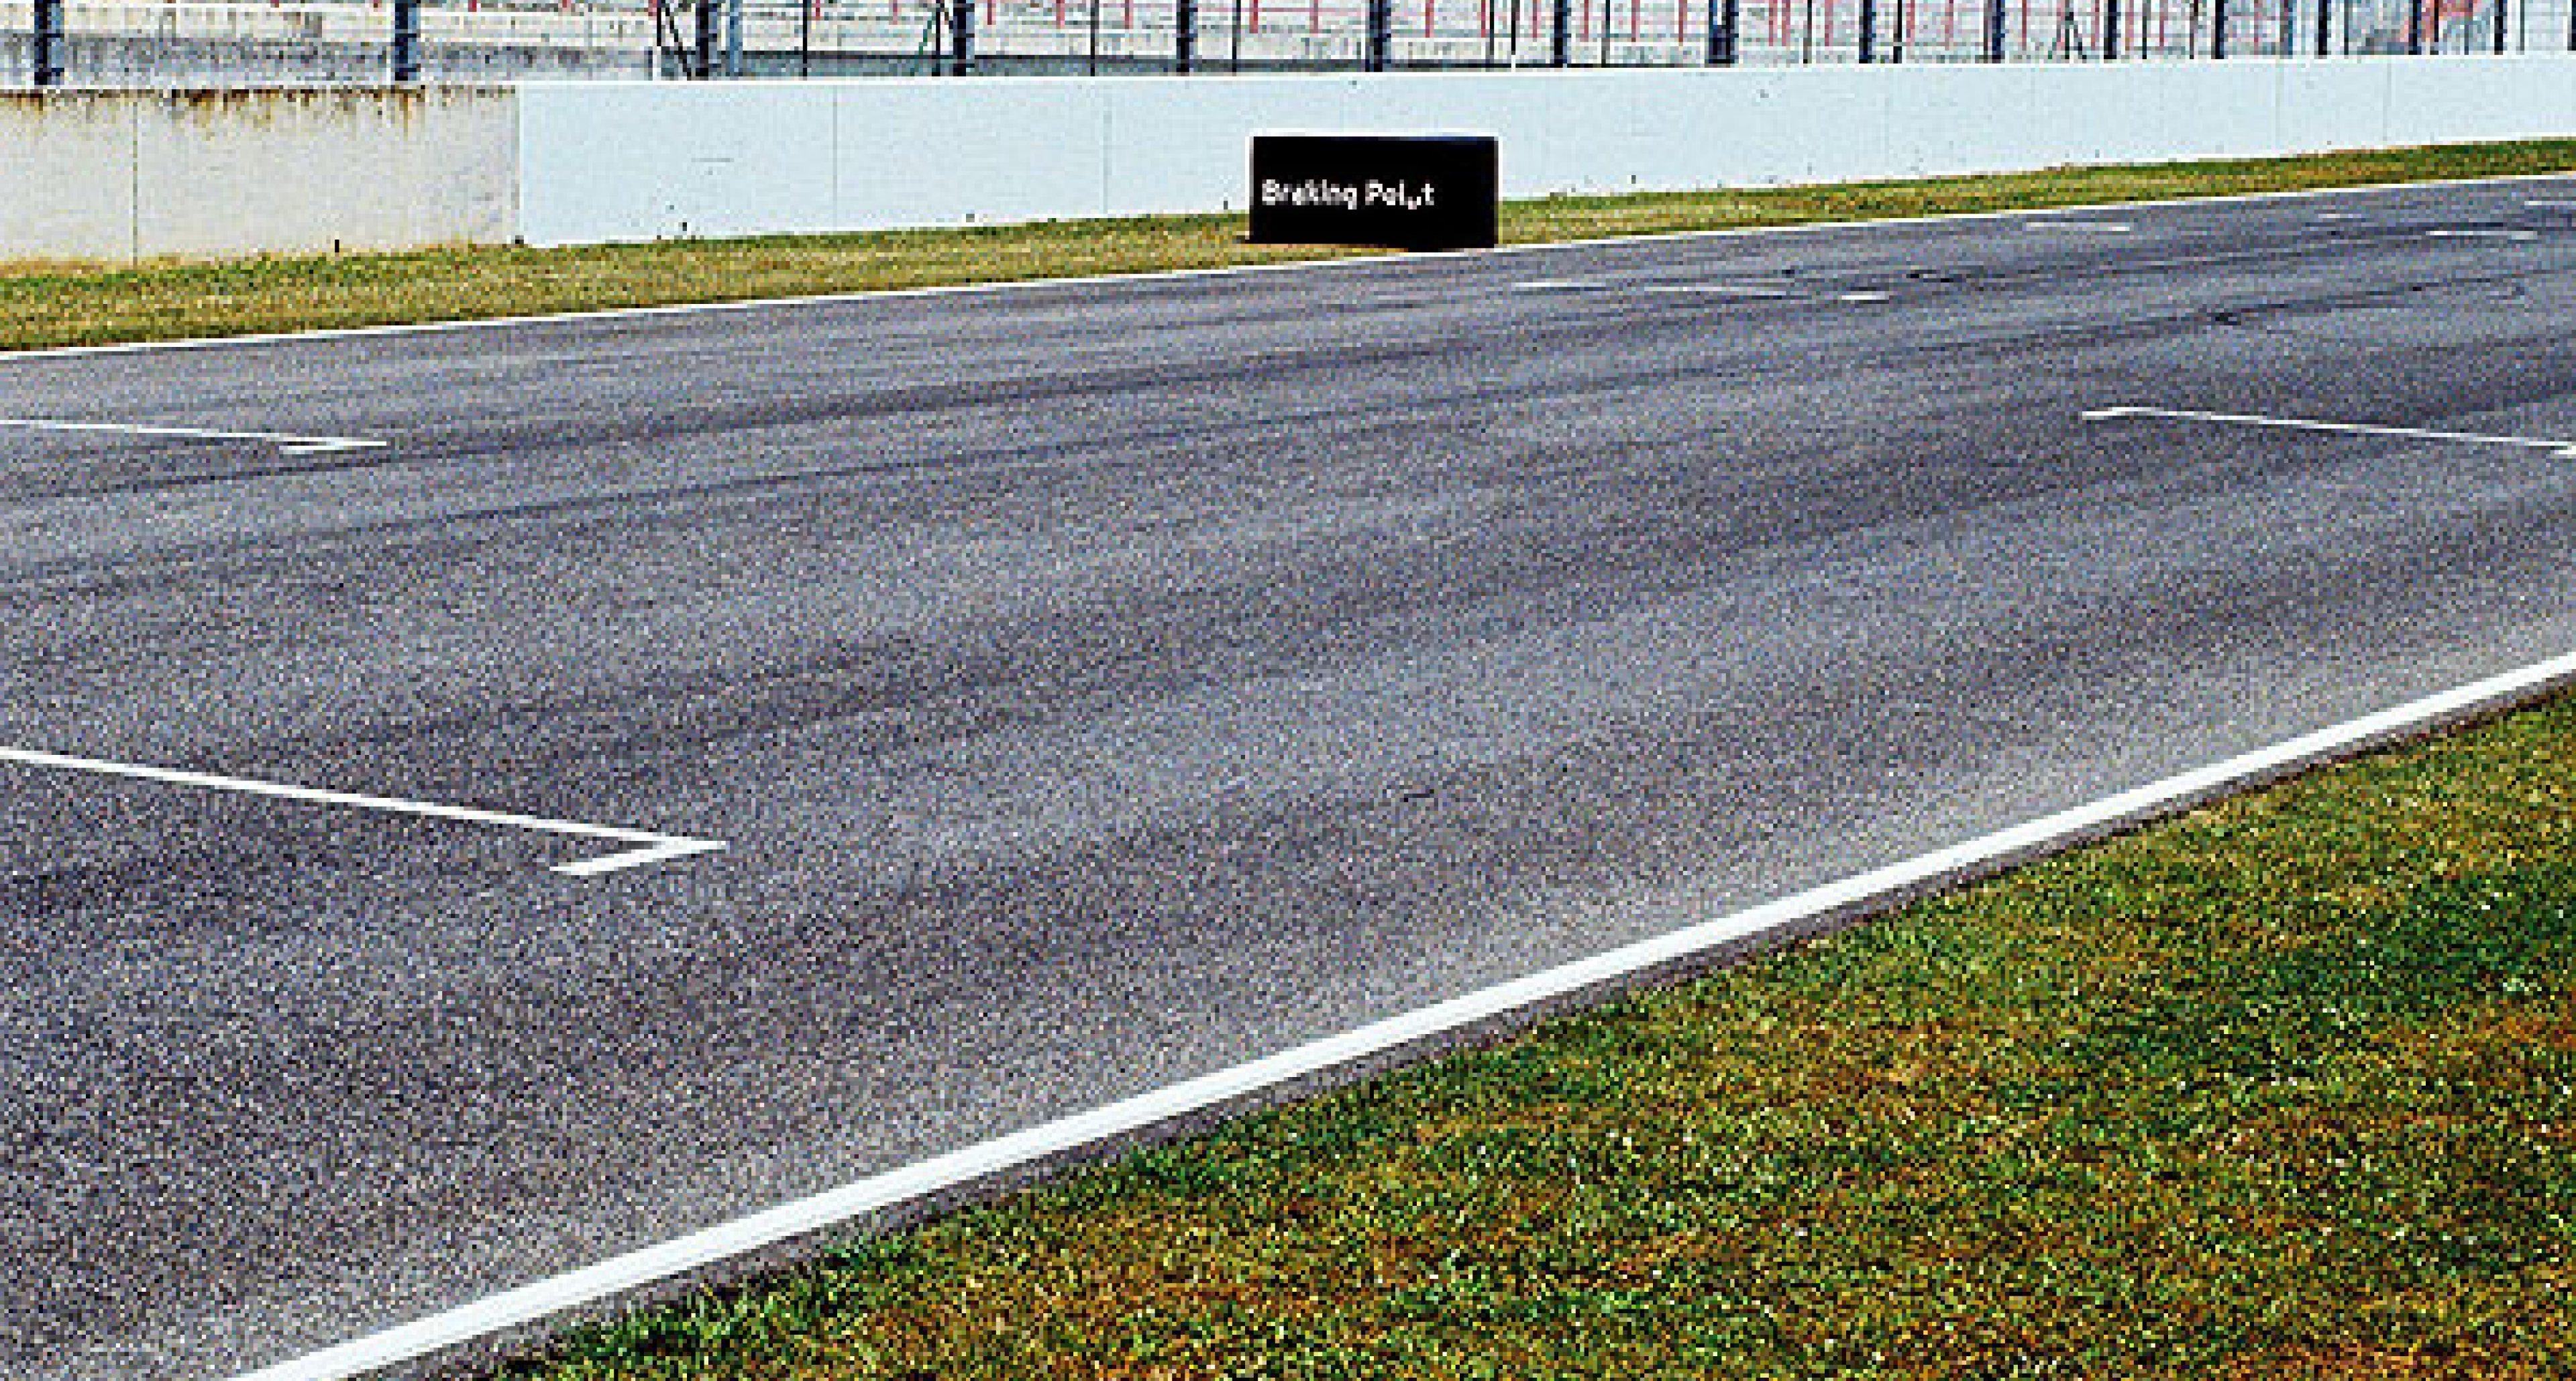 Lamborghini Murciélago LP640 - on the track